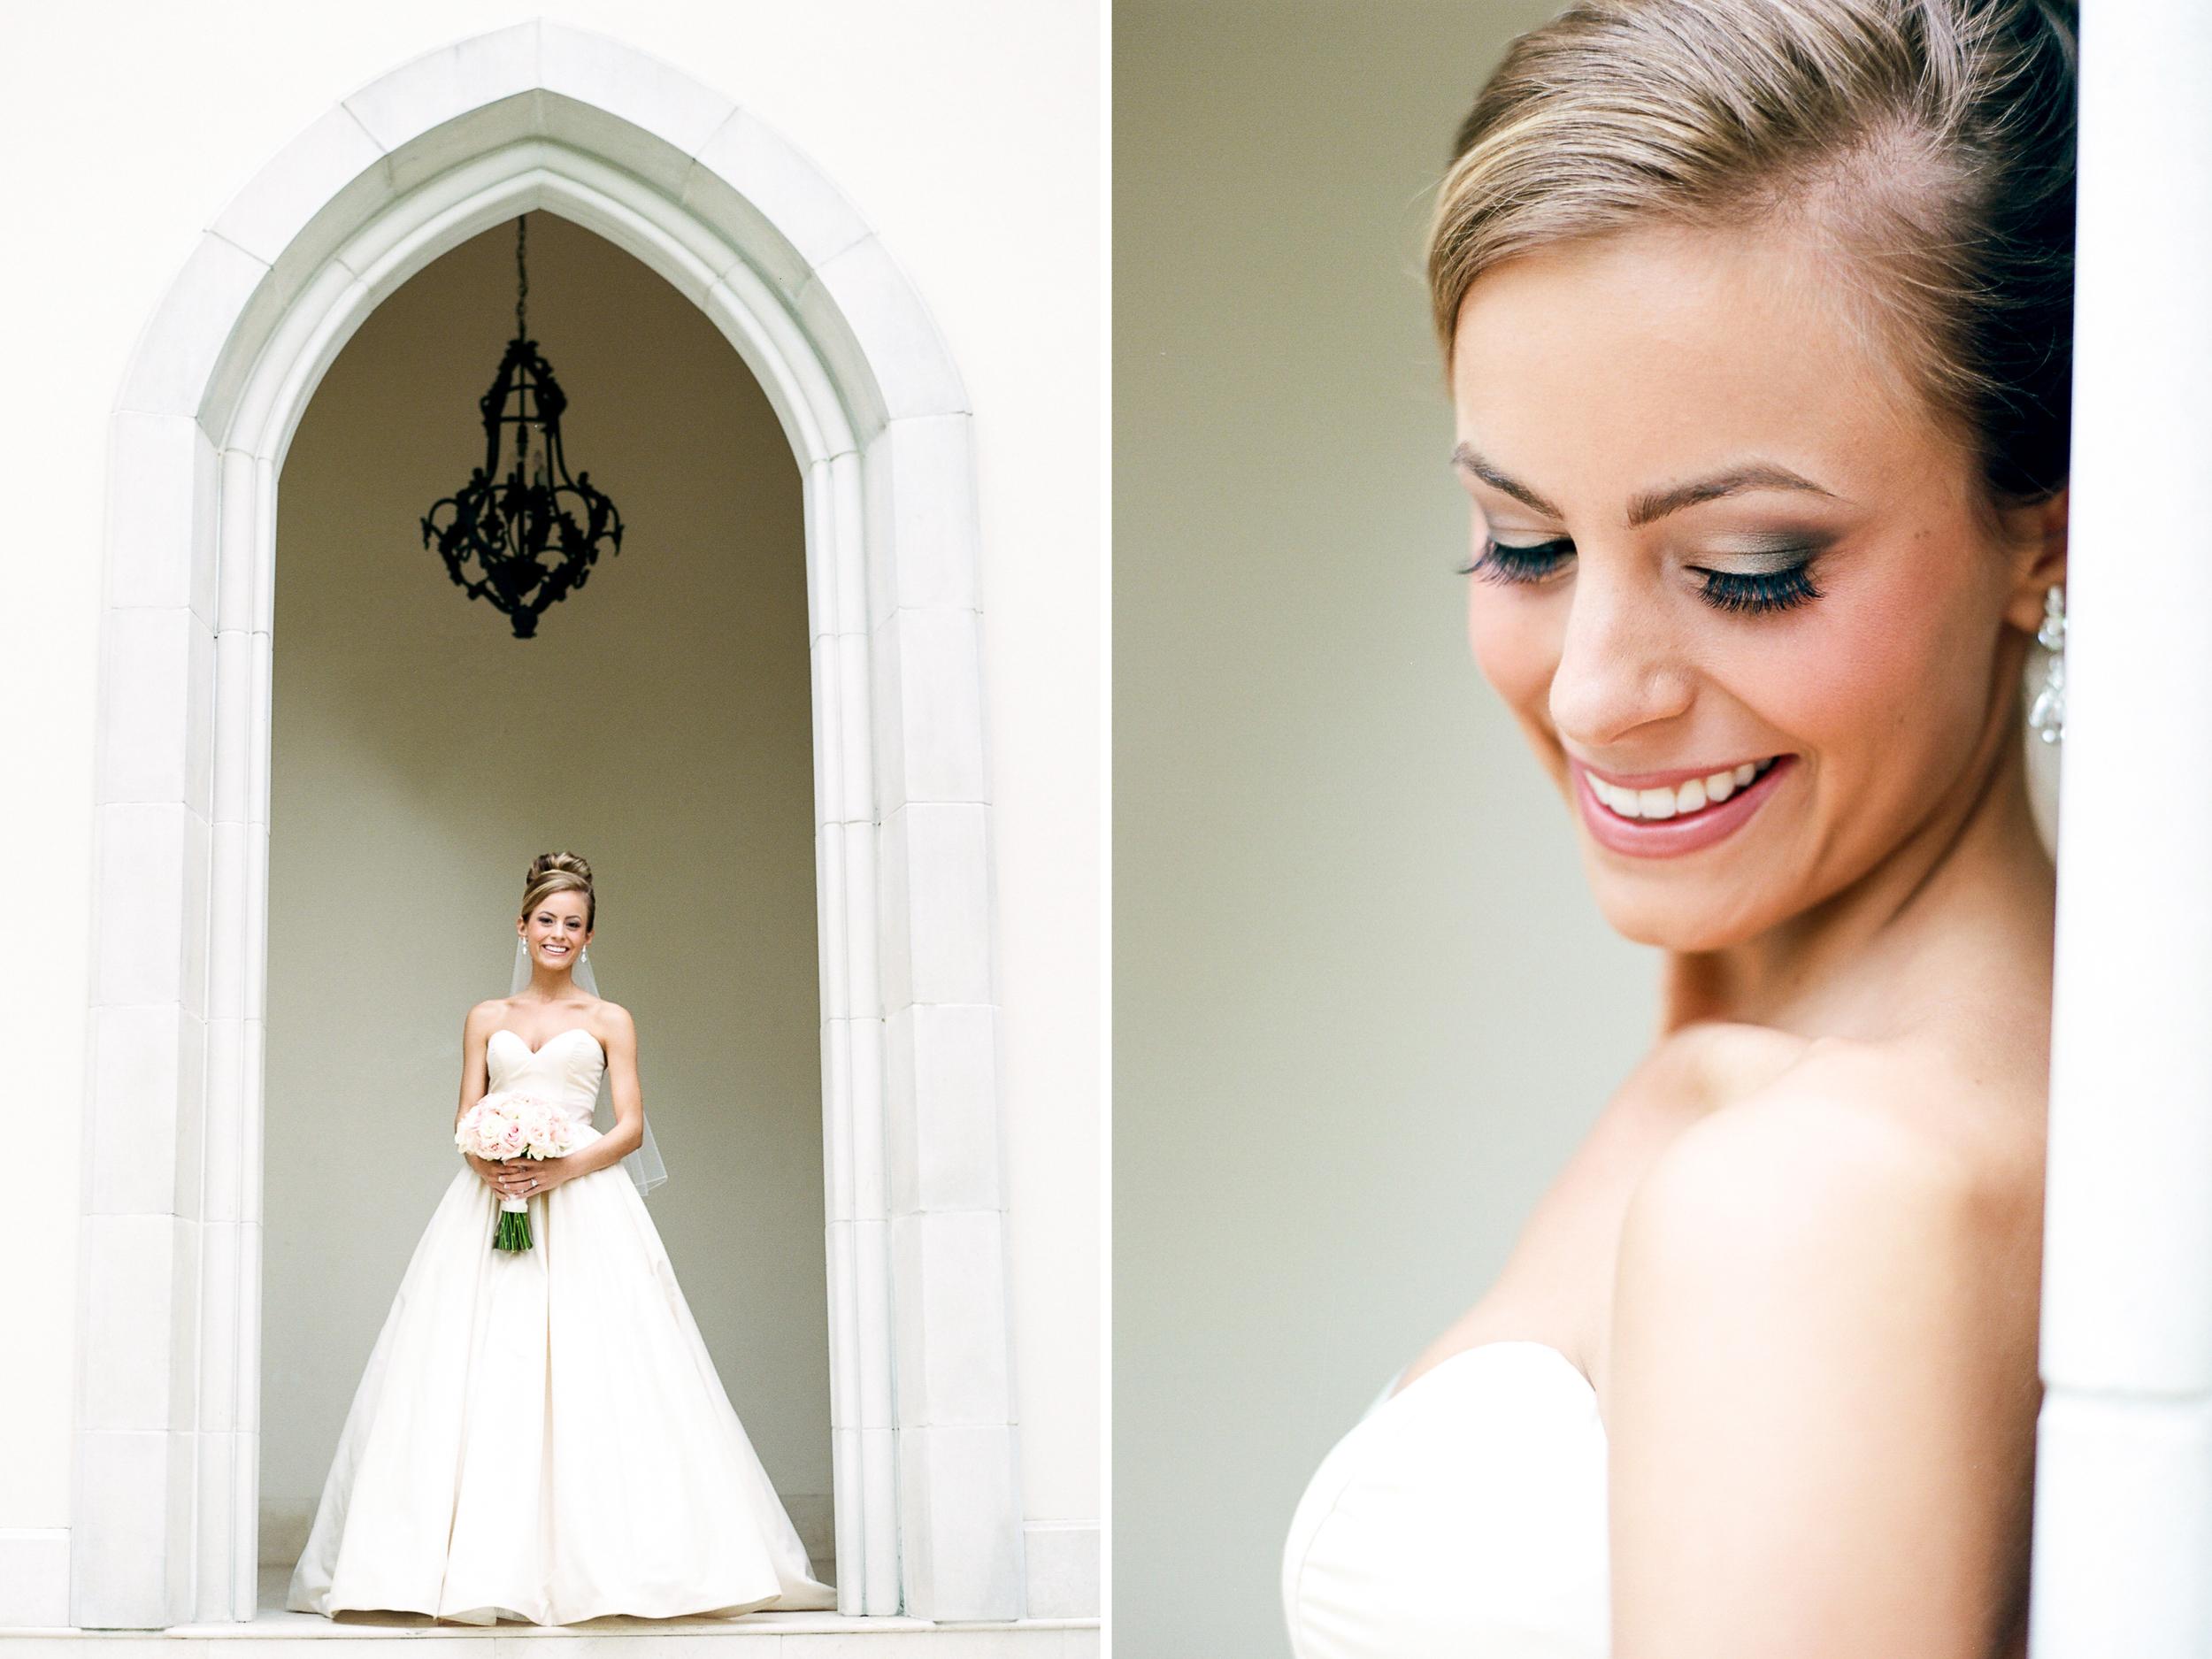 Dana-Fernandez-Photography-Houston-Wedding-Photographer-Style-Me-Pretty-Film-Texas-Destination-Photographer-130.jpg